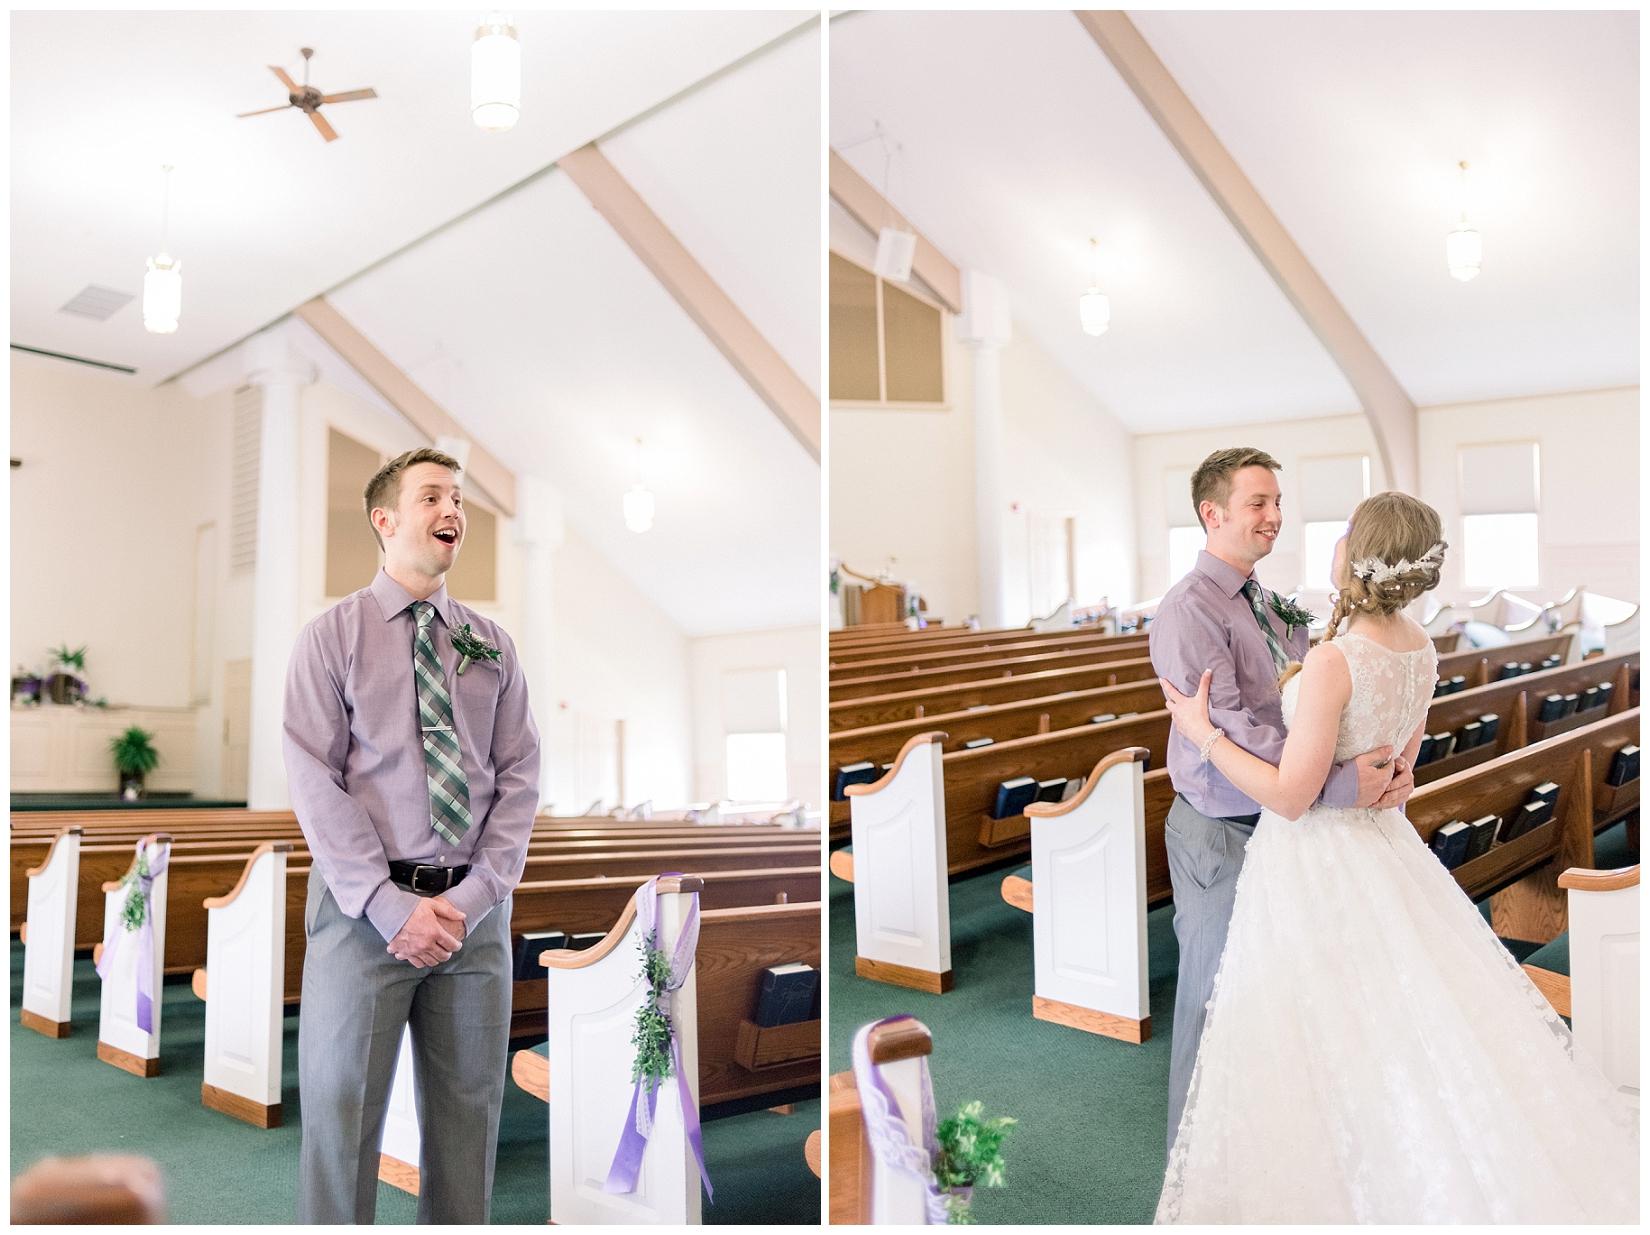 cat-alkire-wedding-photographer-indiana-chicago-indianapolis-fort-wayne_1298.jpg